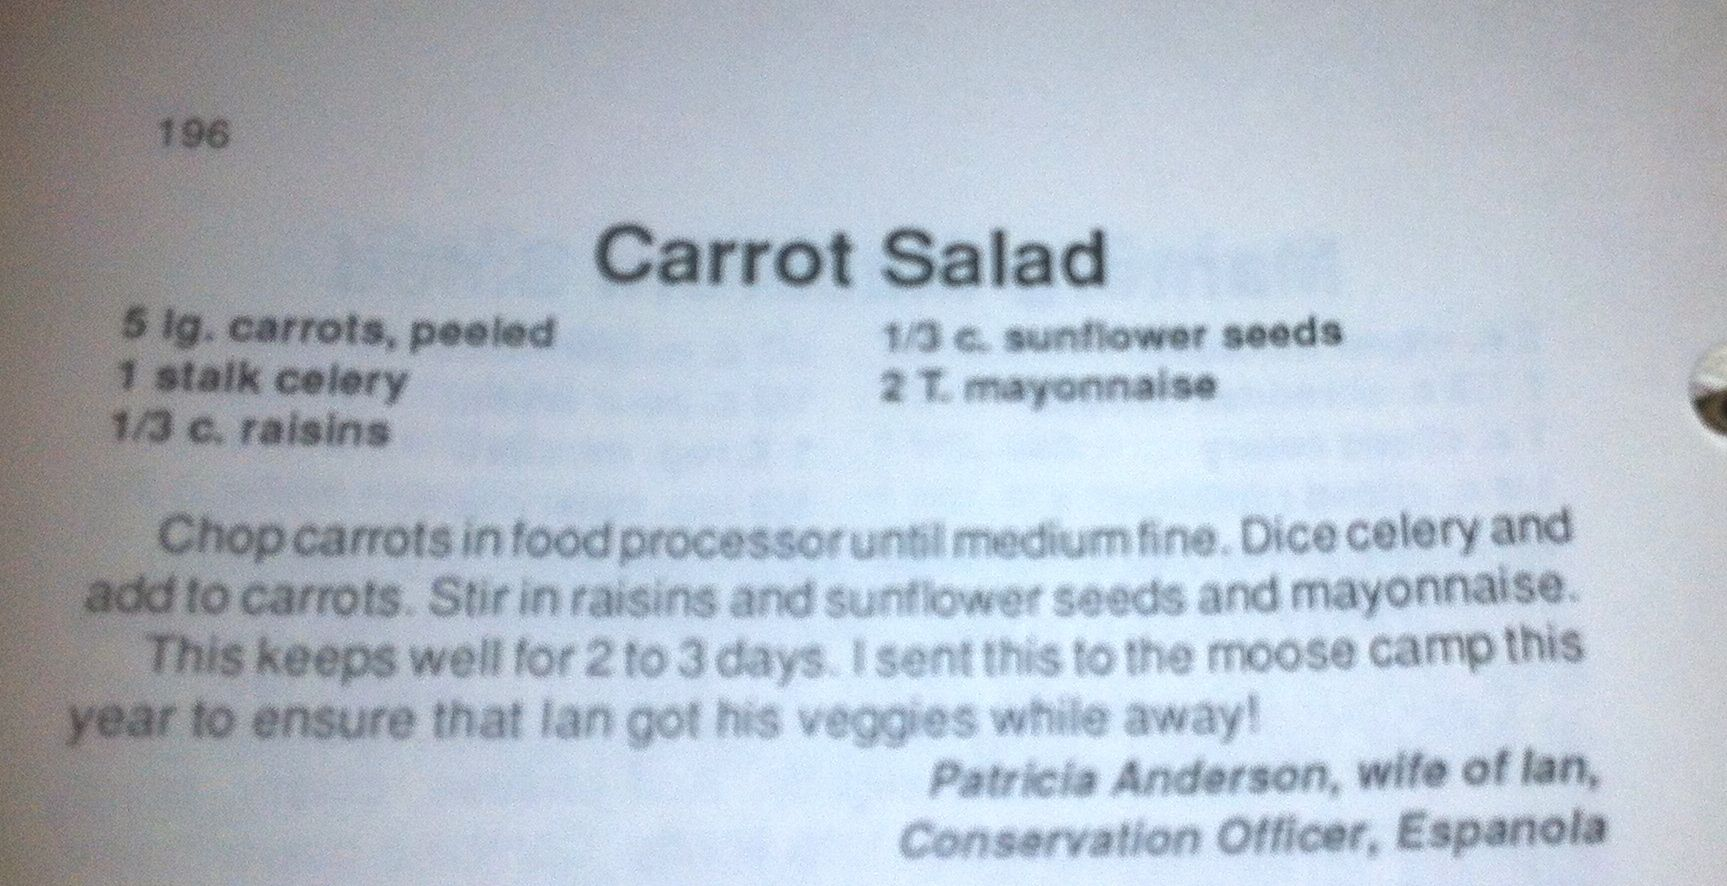 2013 12 19 Carrot Salad